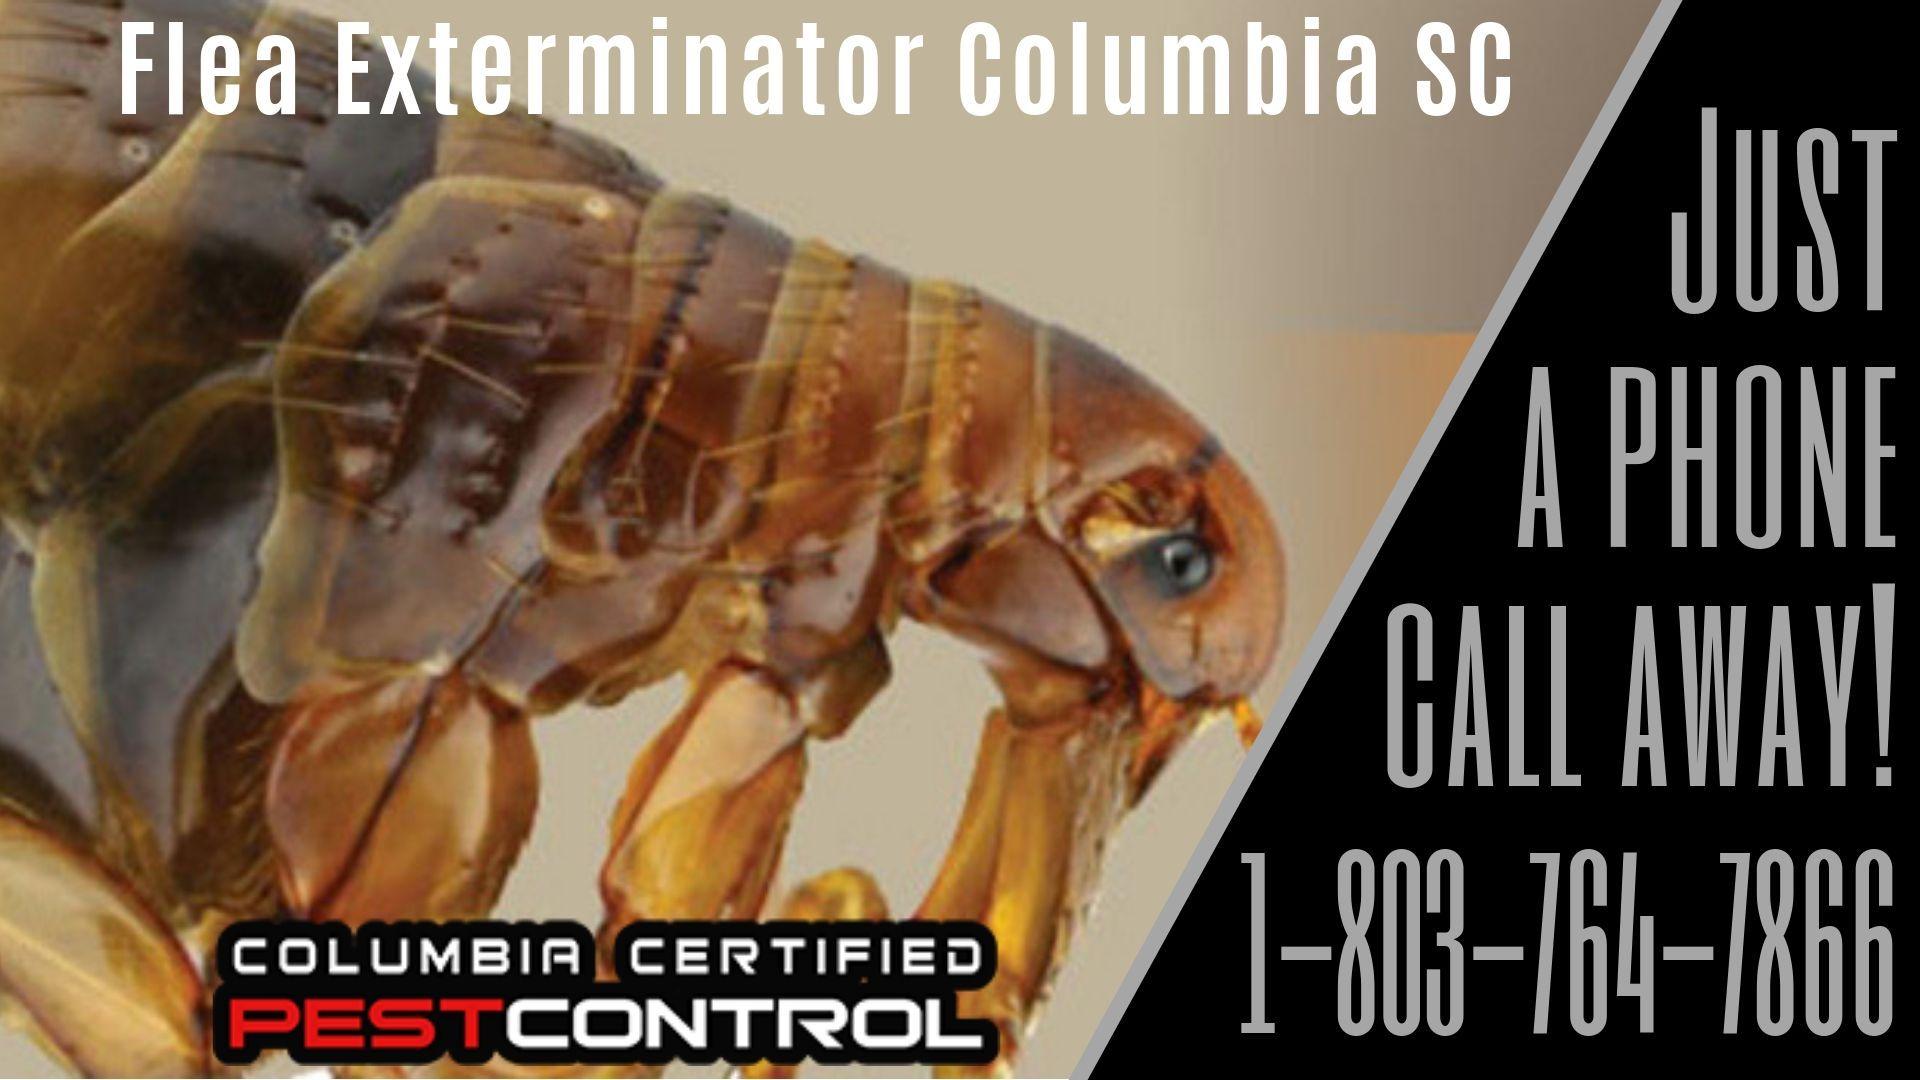 Bed Bug Heat Treatment Columbia Sc Best Pest Control Pest Control Pest Control Services